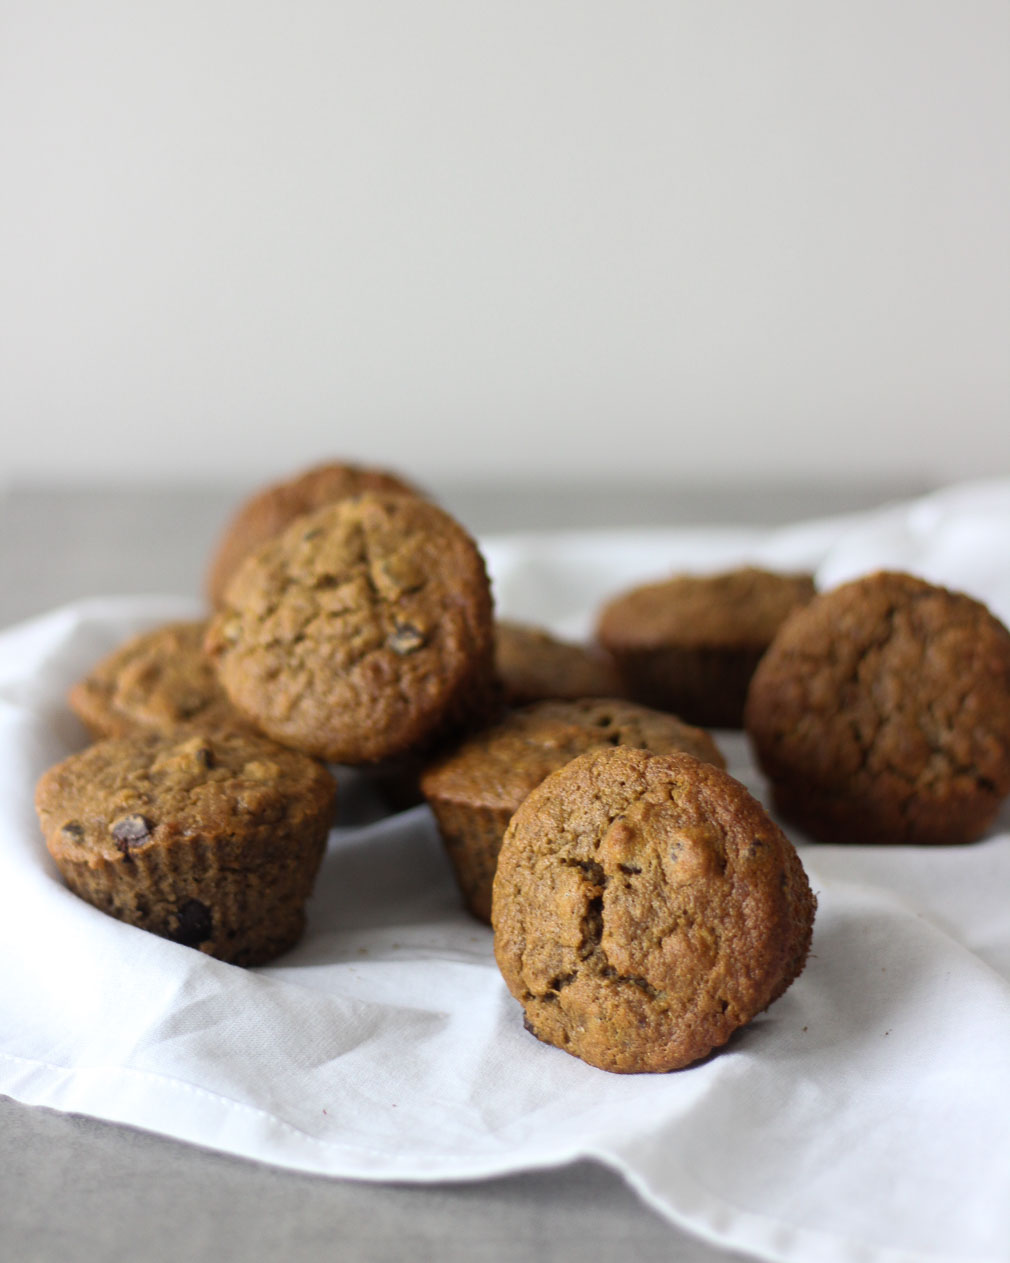 nut-free_dairyfree_paleo_glutenfree_nut-free_banana_bread_muffins (2 of 4).JPG